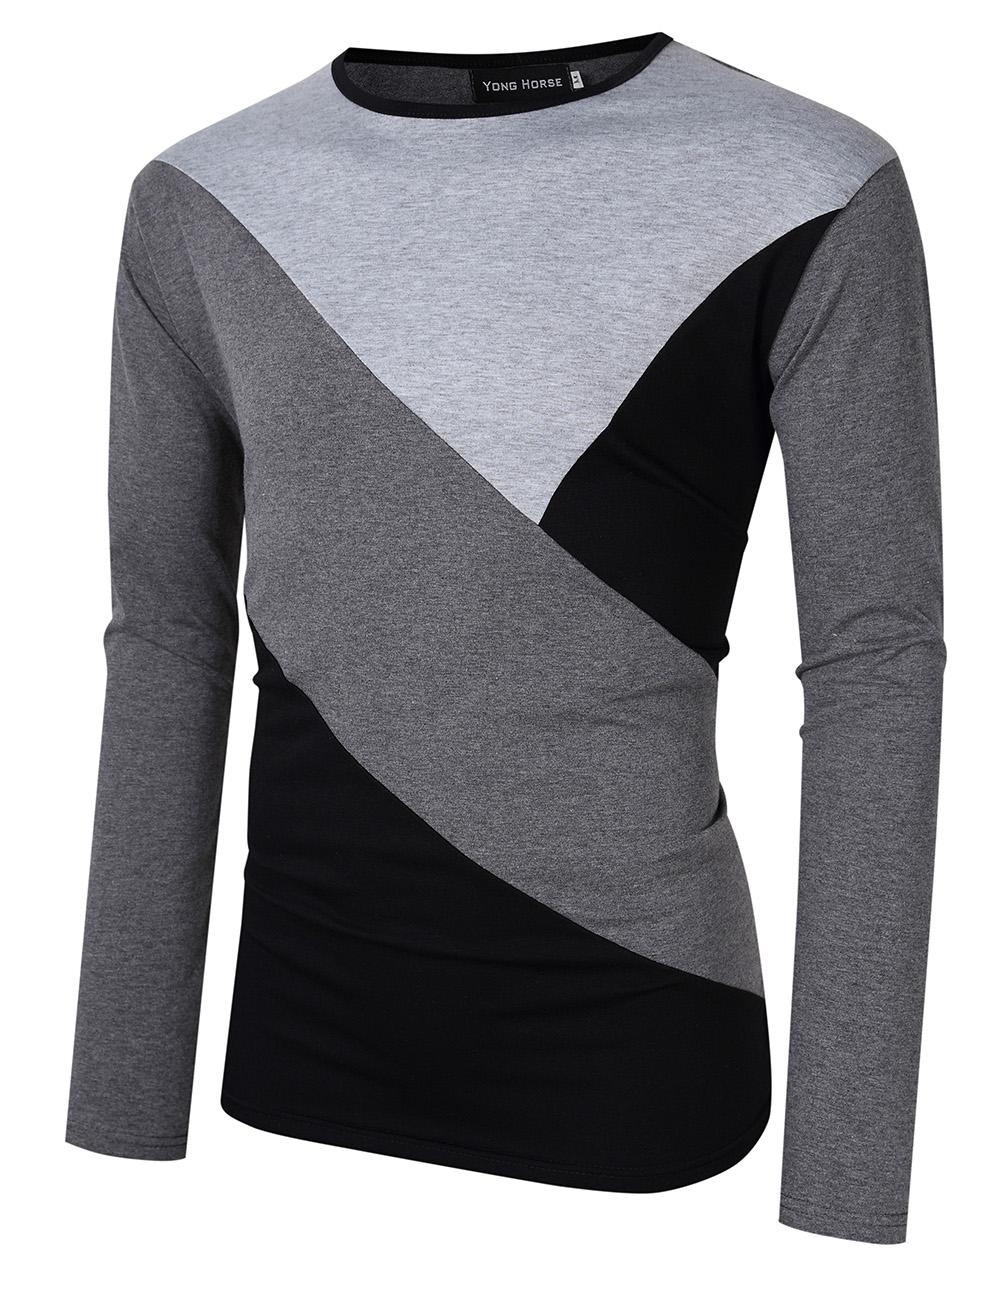 [US Direct] Yong Horse Men's Contrast Color Crewneck Long Sleeve Basic T Shirt Top Light gray + gray_XL